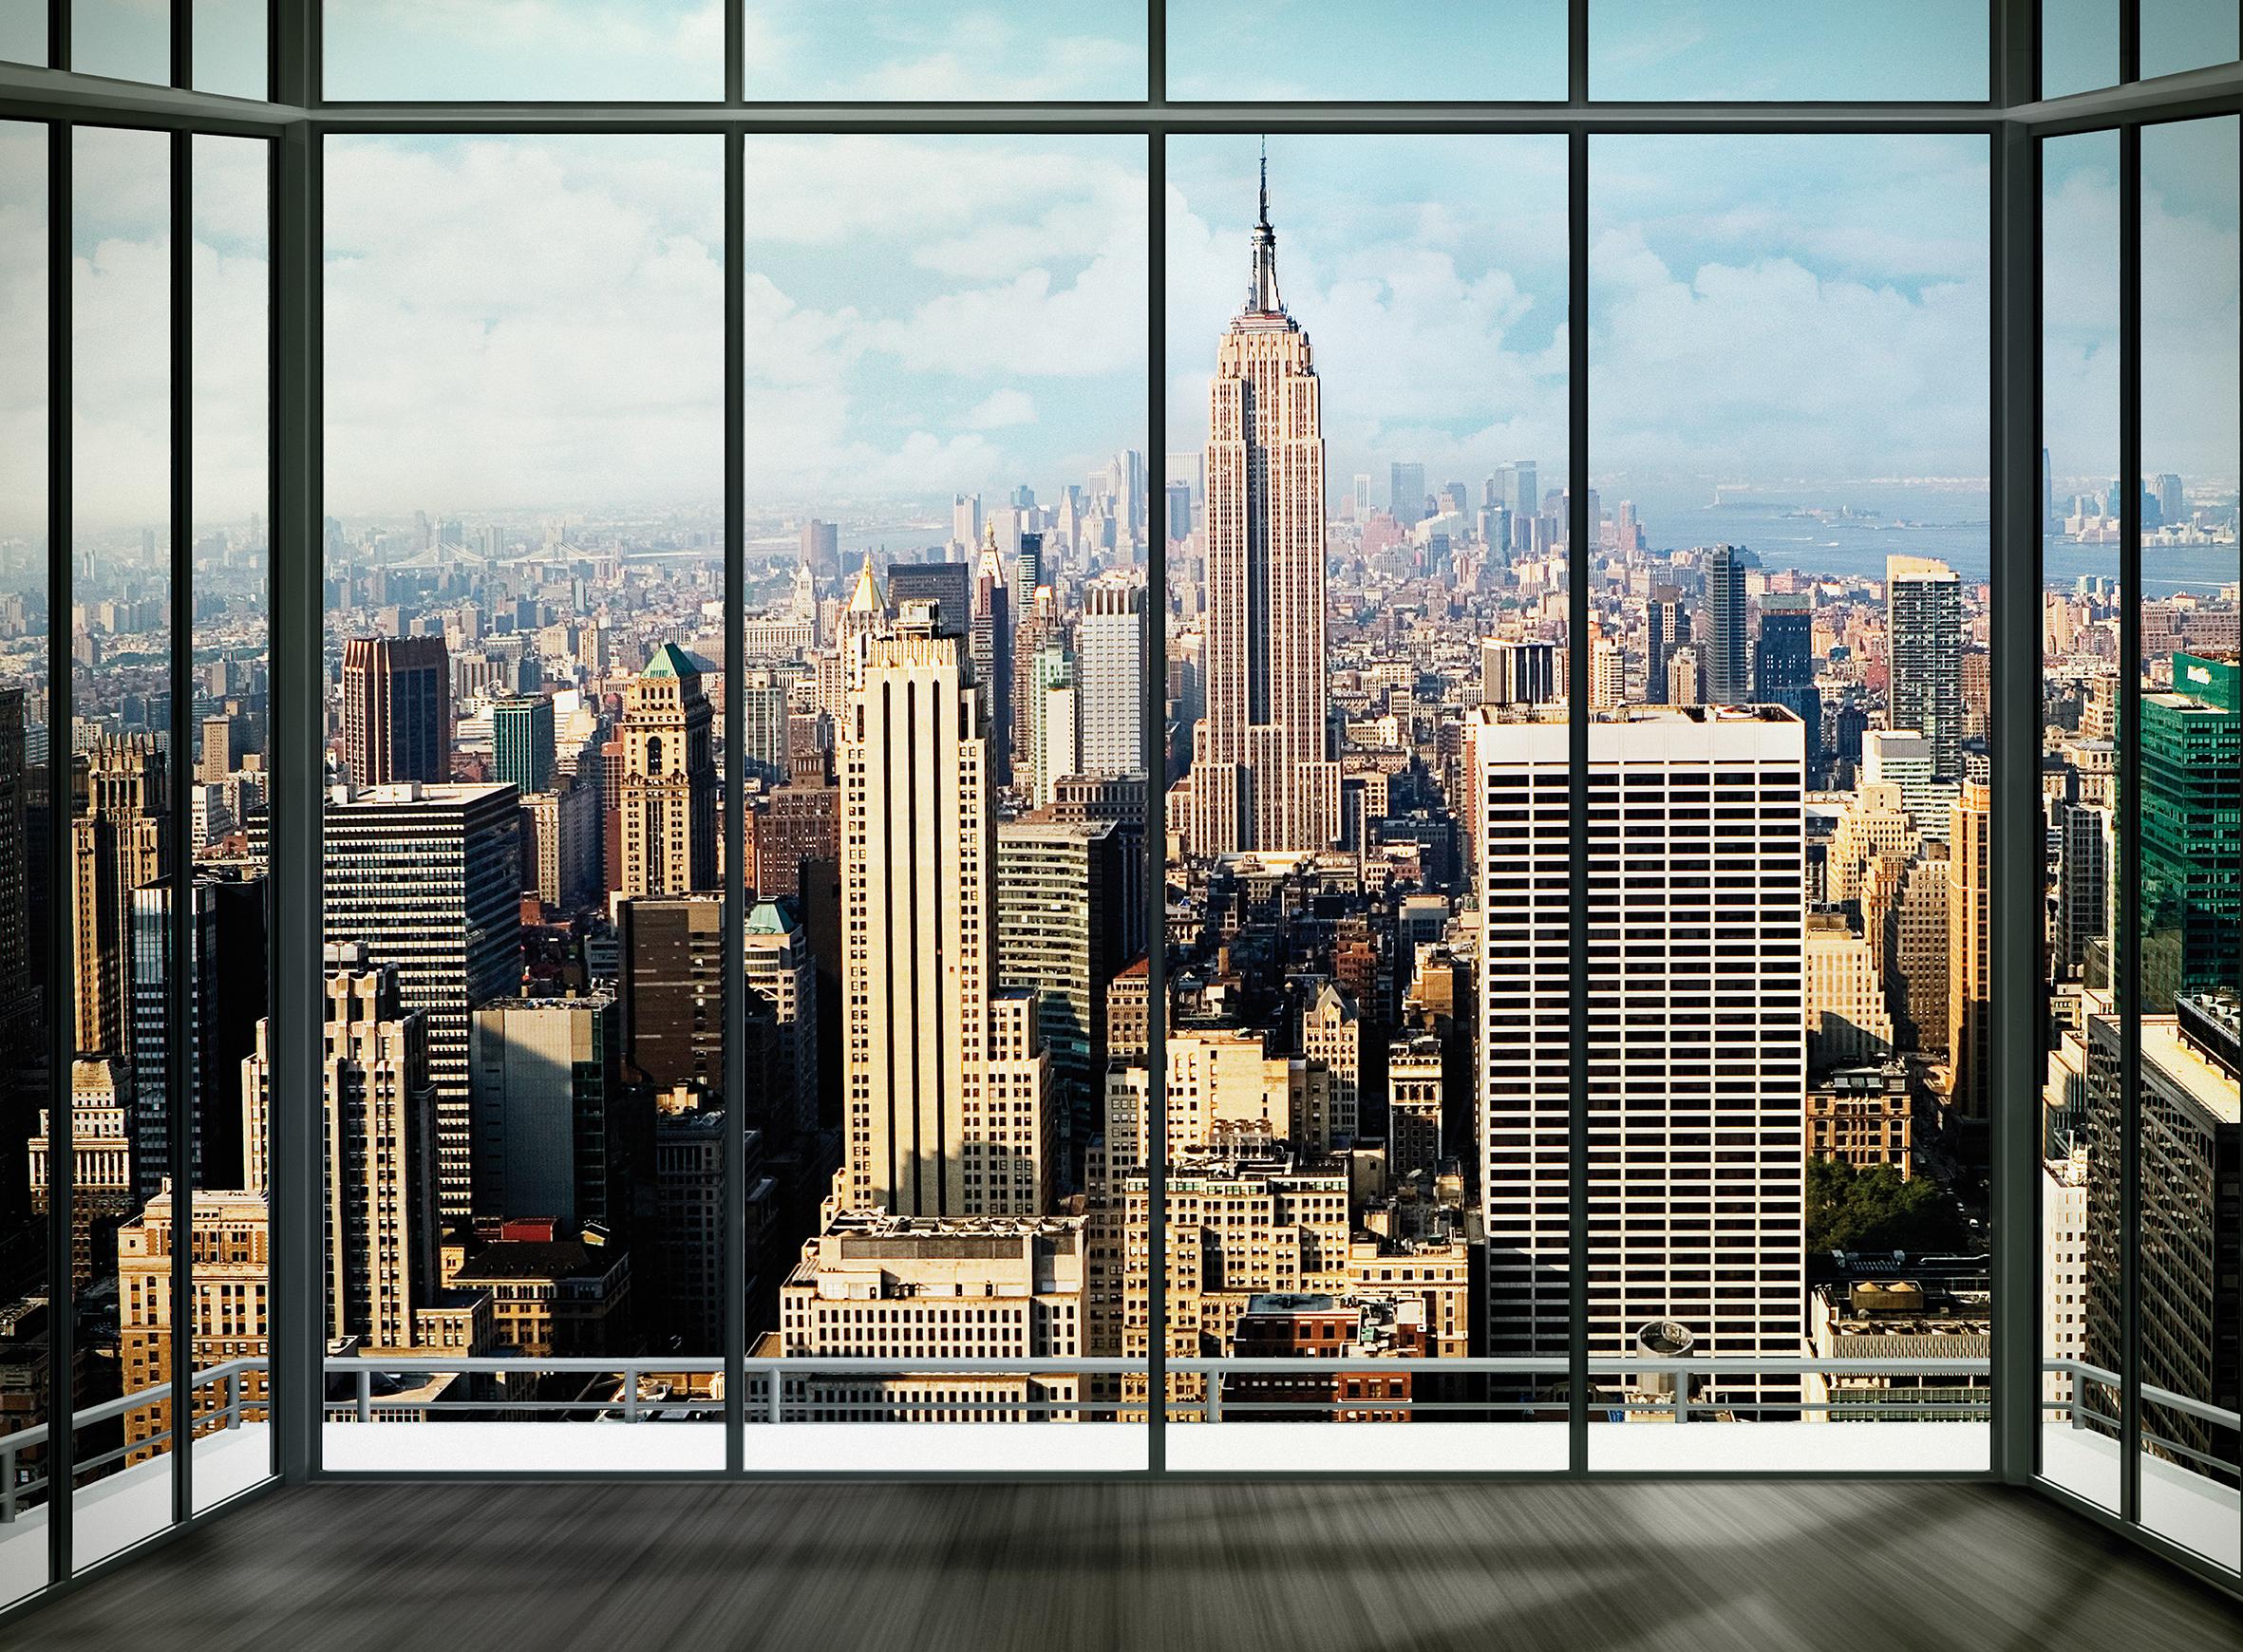 Wall Mural New York Skyline Window Wallsorts 2362x1740